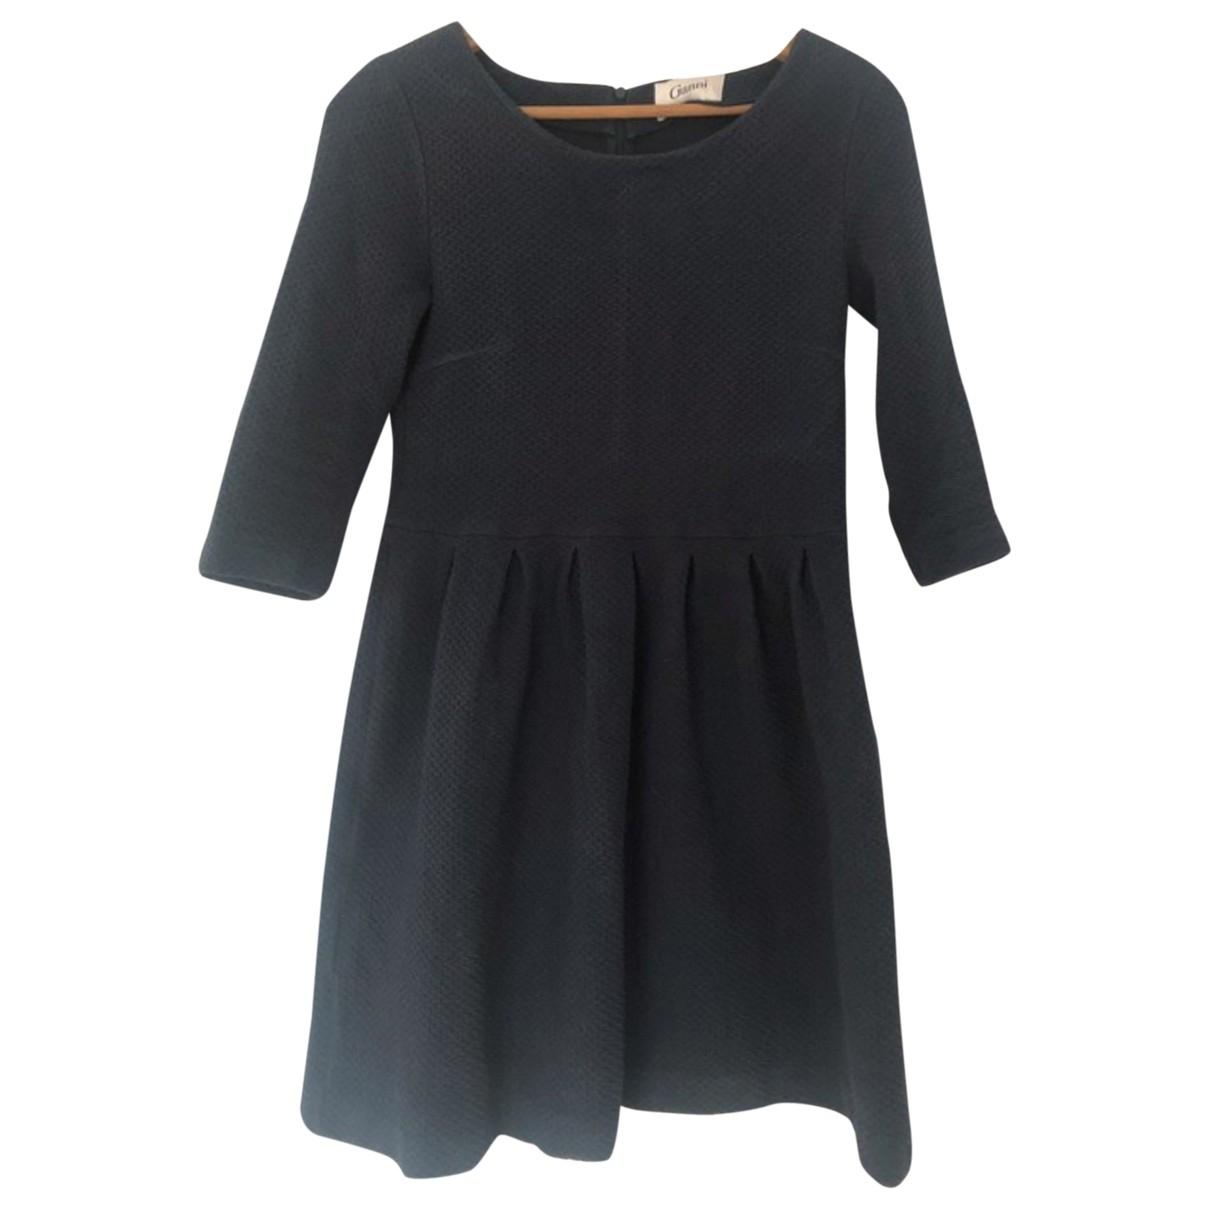 Ganni \N Kleid in  Blau Baumwolle - Elasthan